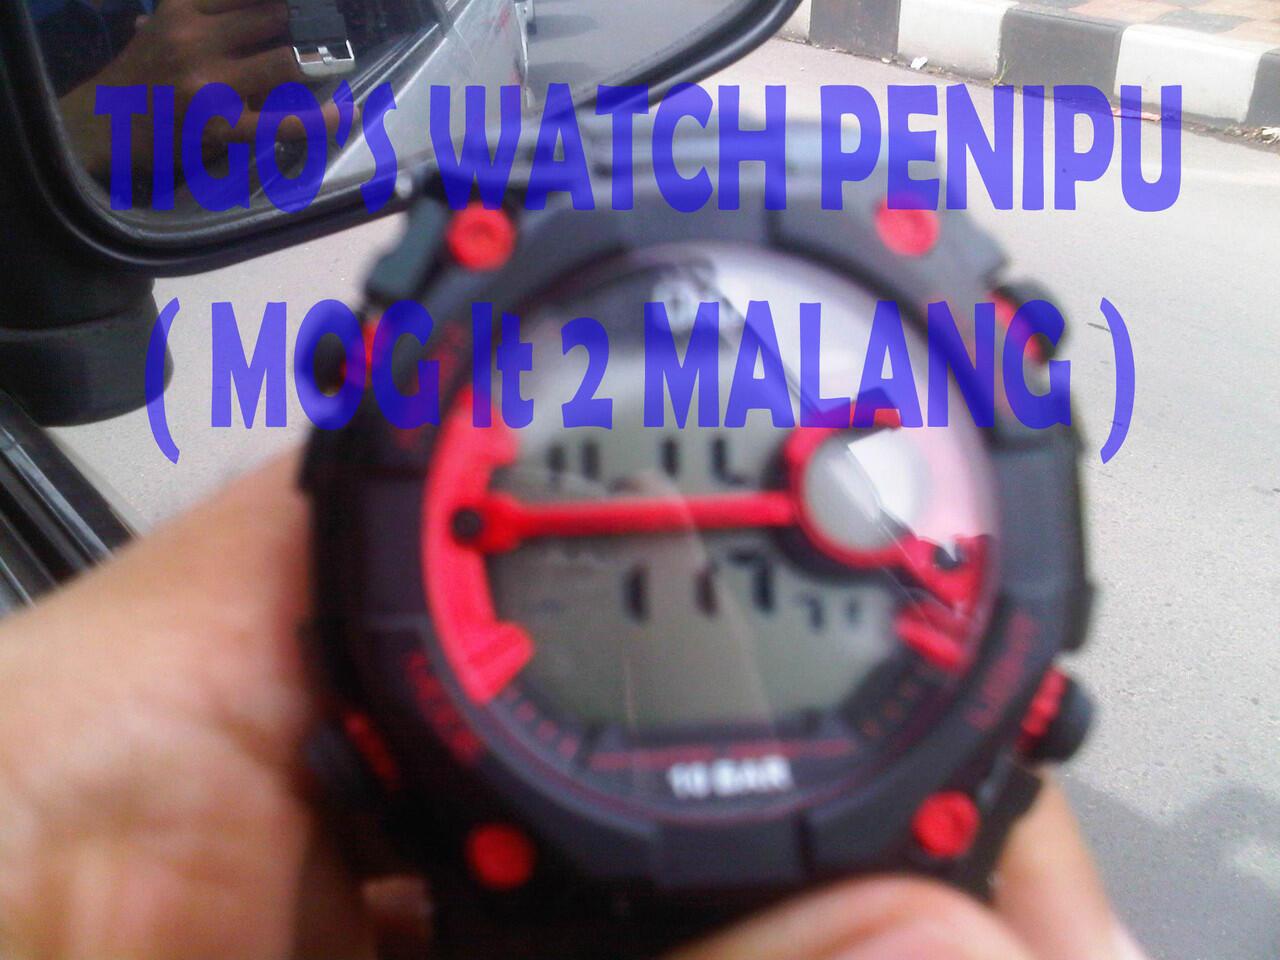 Hati-hati beli jam di TIGO s WATCH MOG lantai 2 MALANG  f9955e7ddf